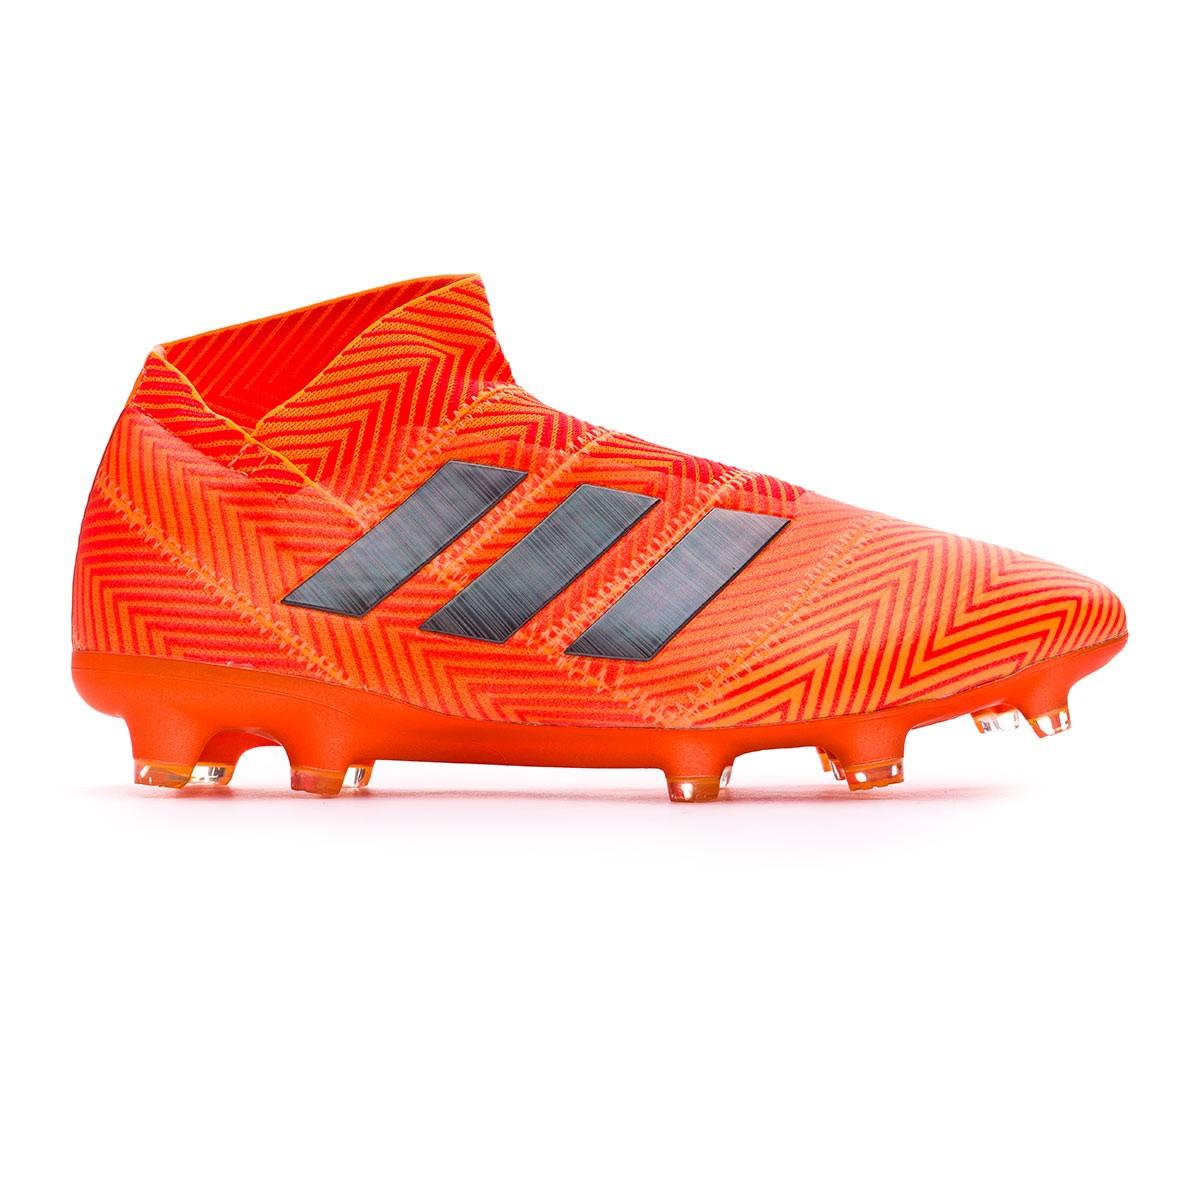 c7cdbe130ae04 Bota de fútbol adidas Nemeziz 18+ FG Zest-Black-Solar red - Tienda de fútbol  Fútbol Emotion